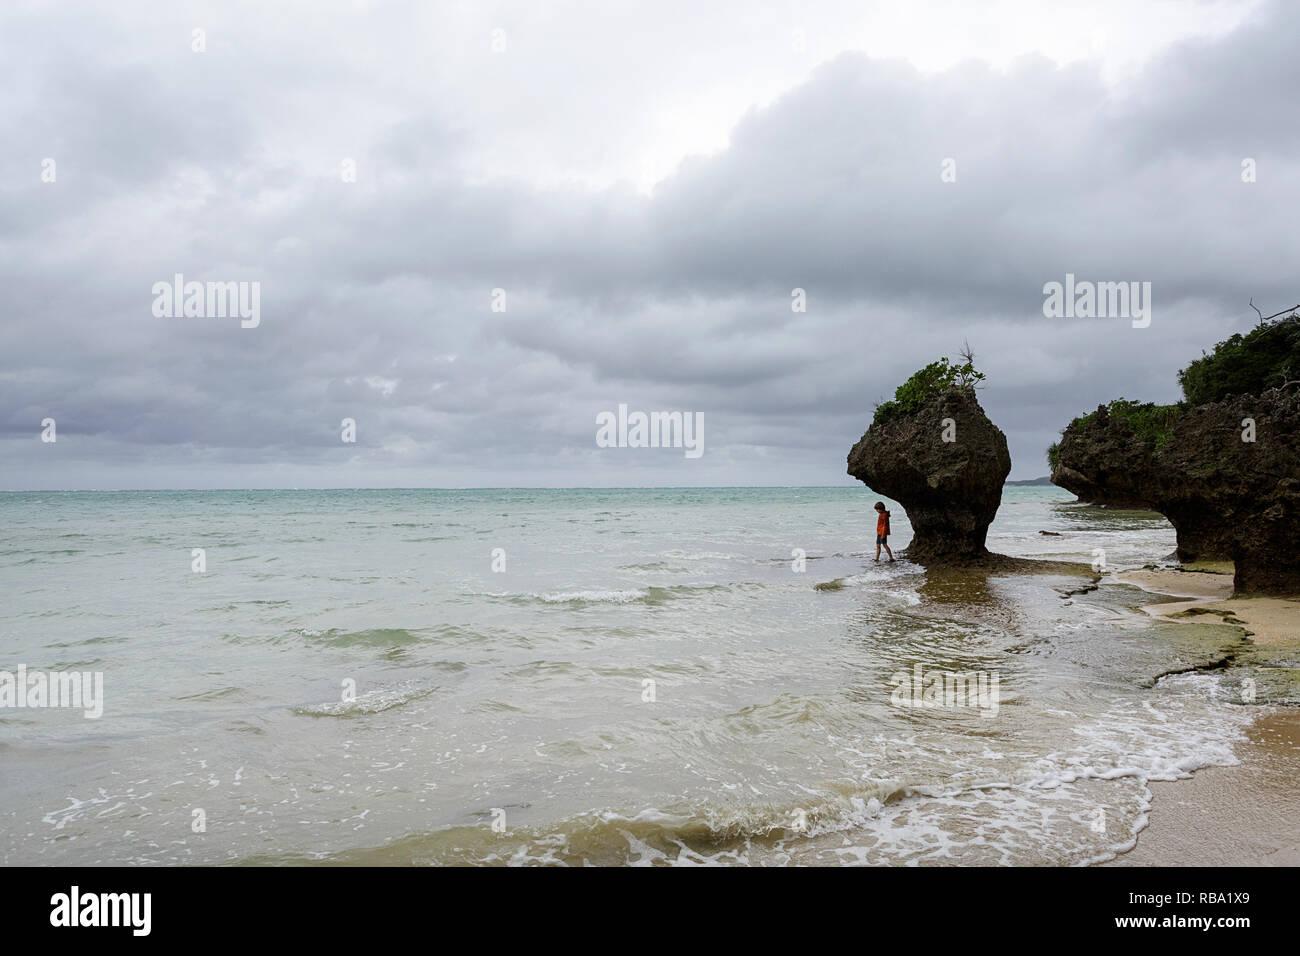 Young boy standing under limestone sculpture by the sea at sandy beach at Ibaruma Sabichi Cave, Ishigaki, Japan Stock Photo